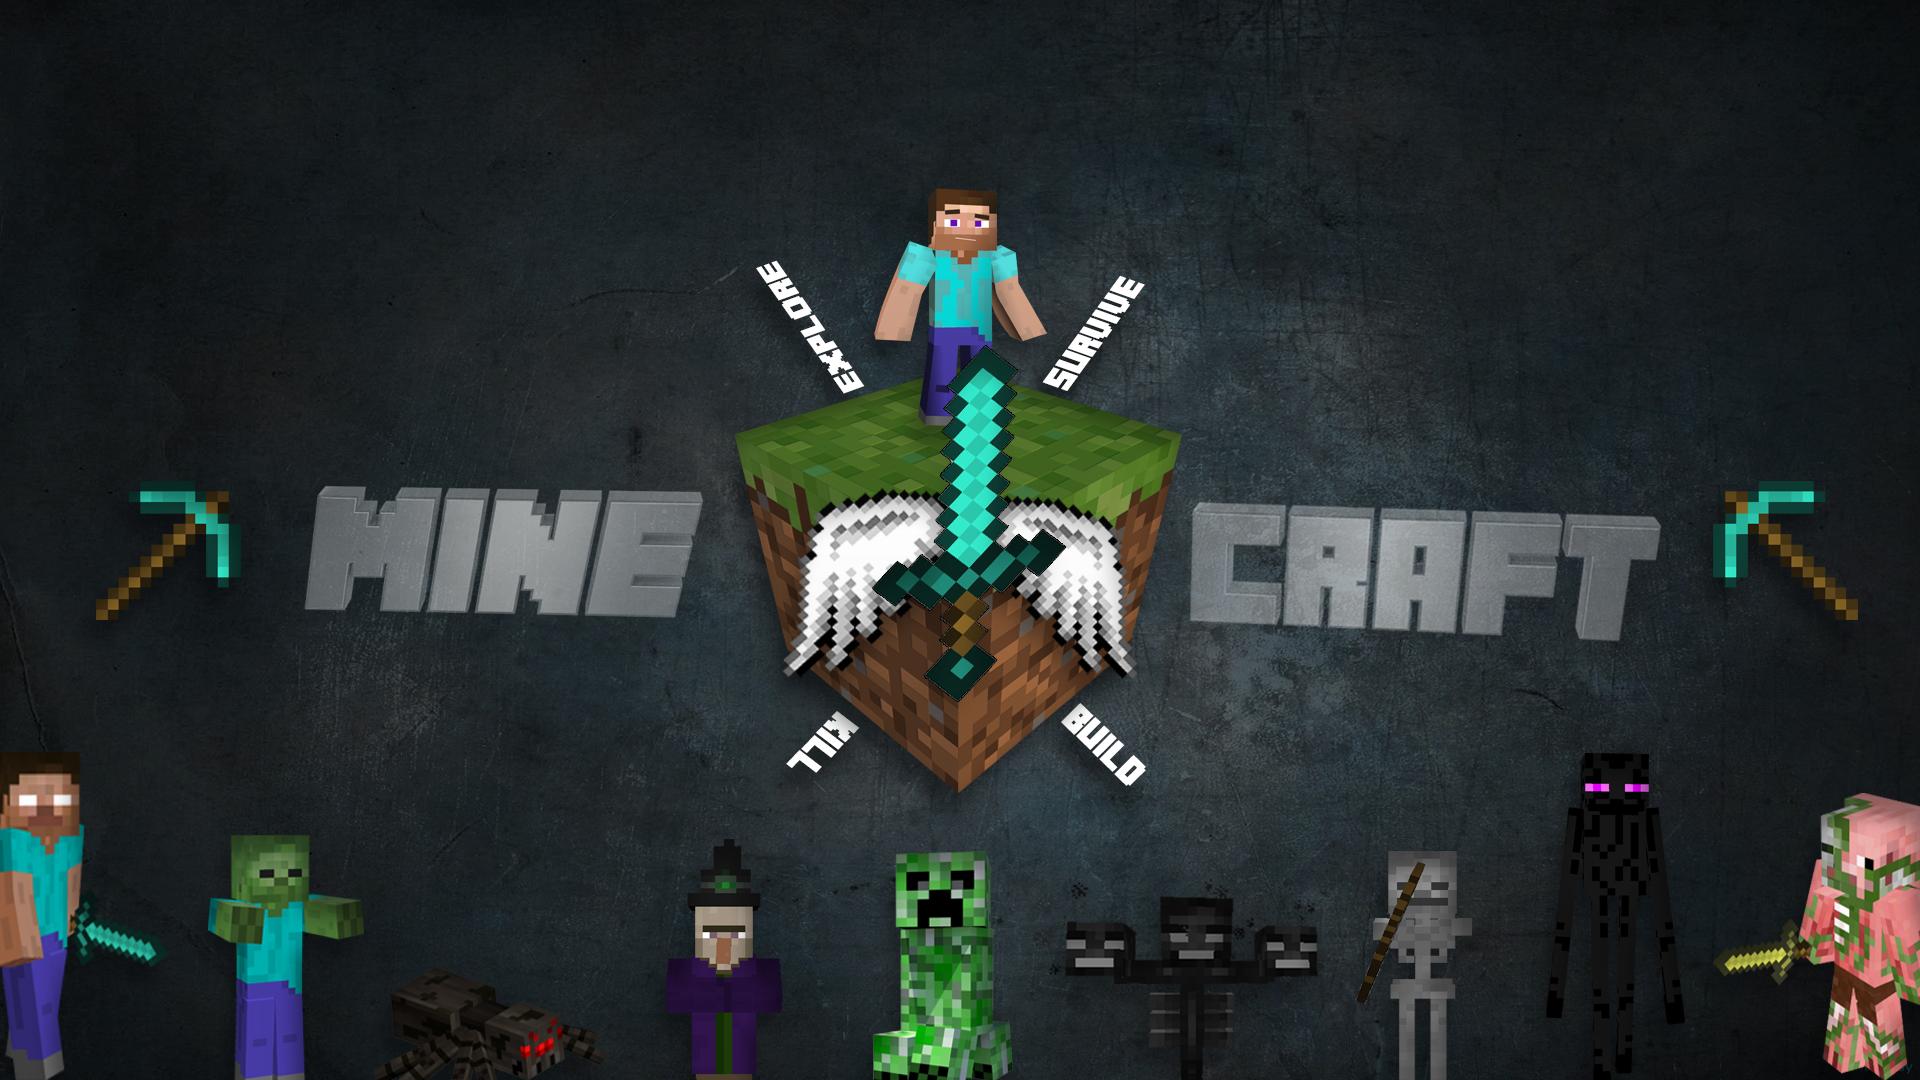 General 1920x1080 Minecraft Herobrine sword Steve craft 3D Blocks adventurers